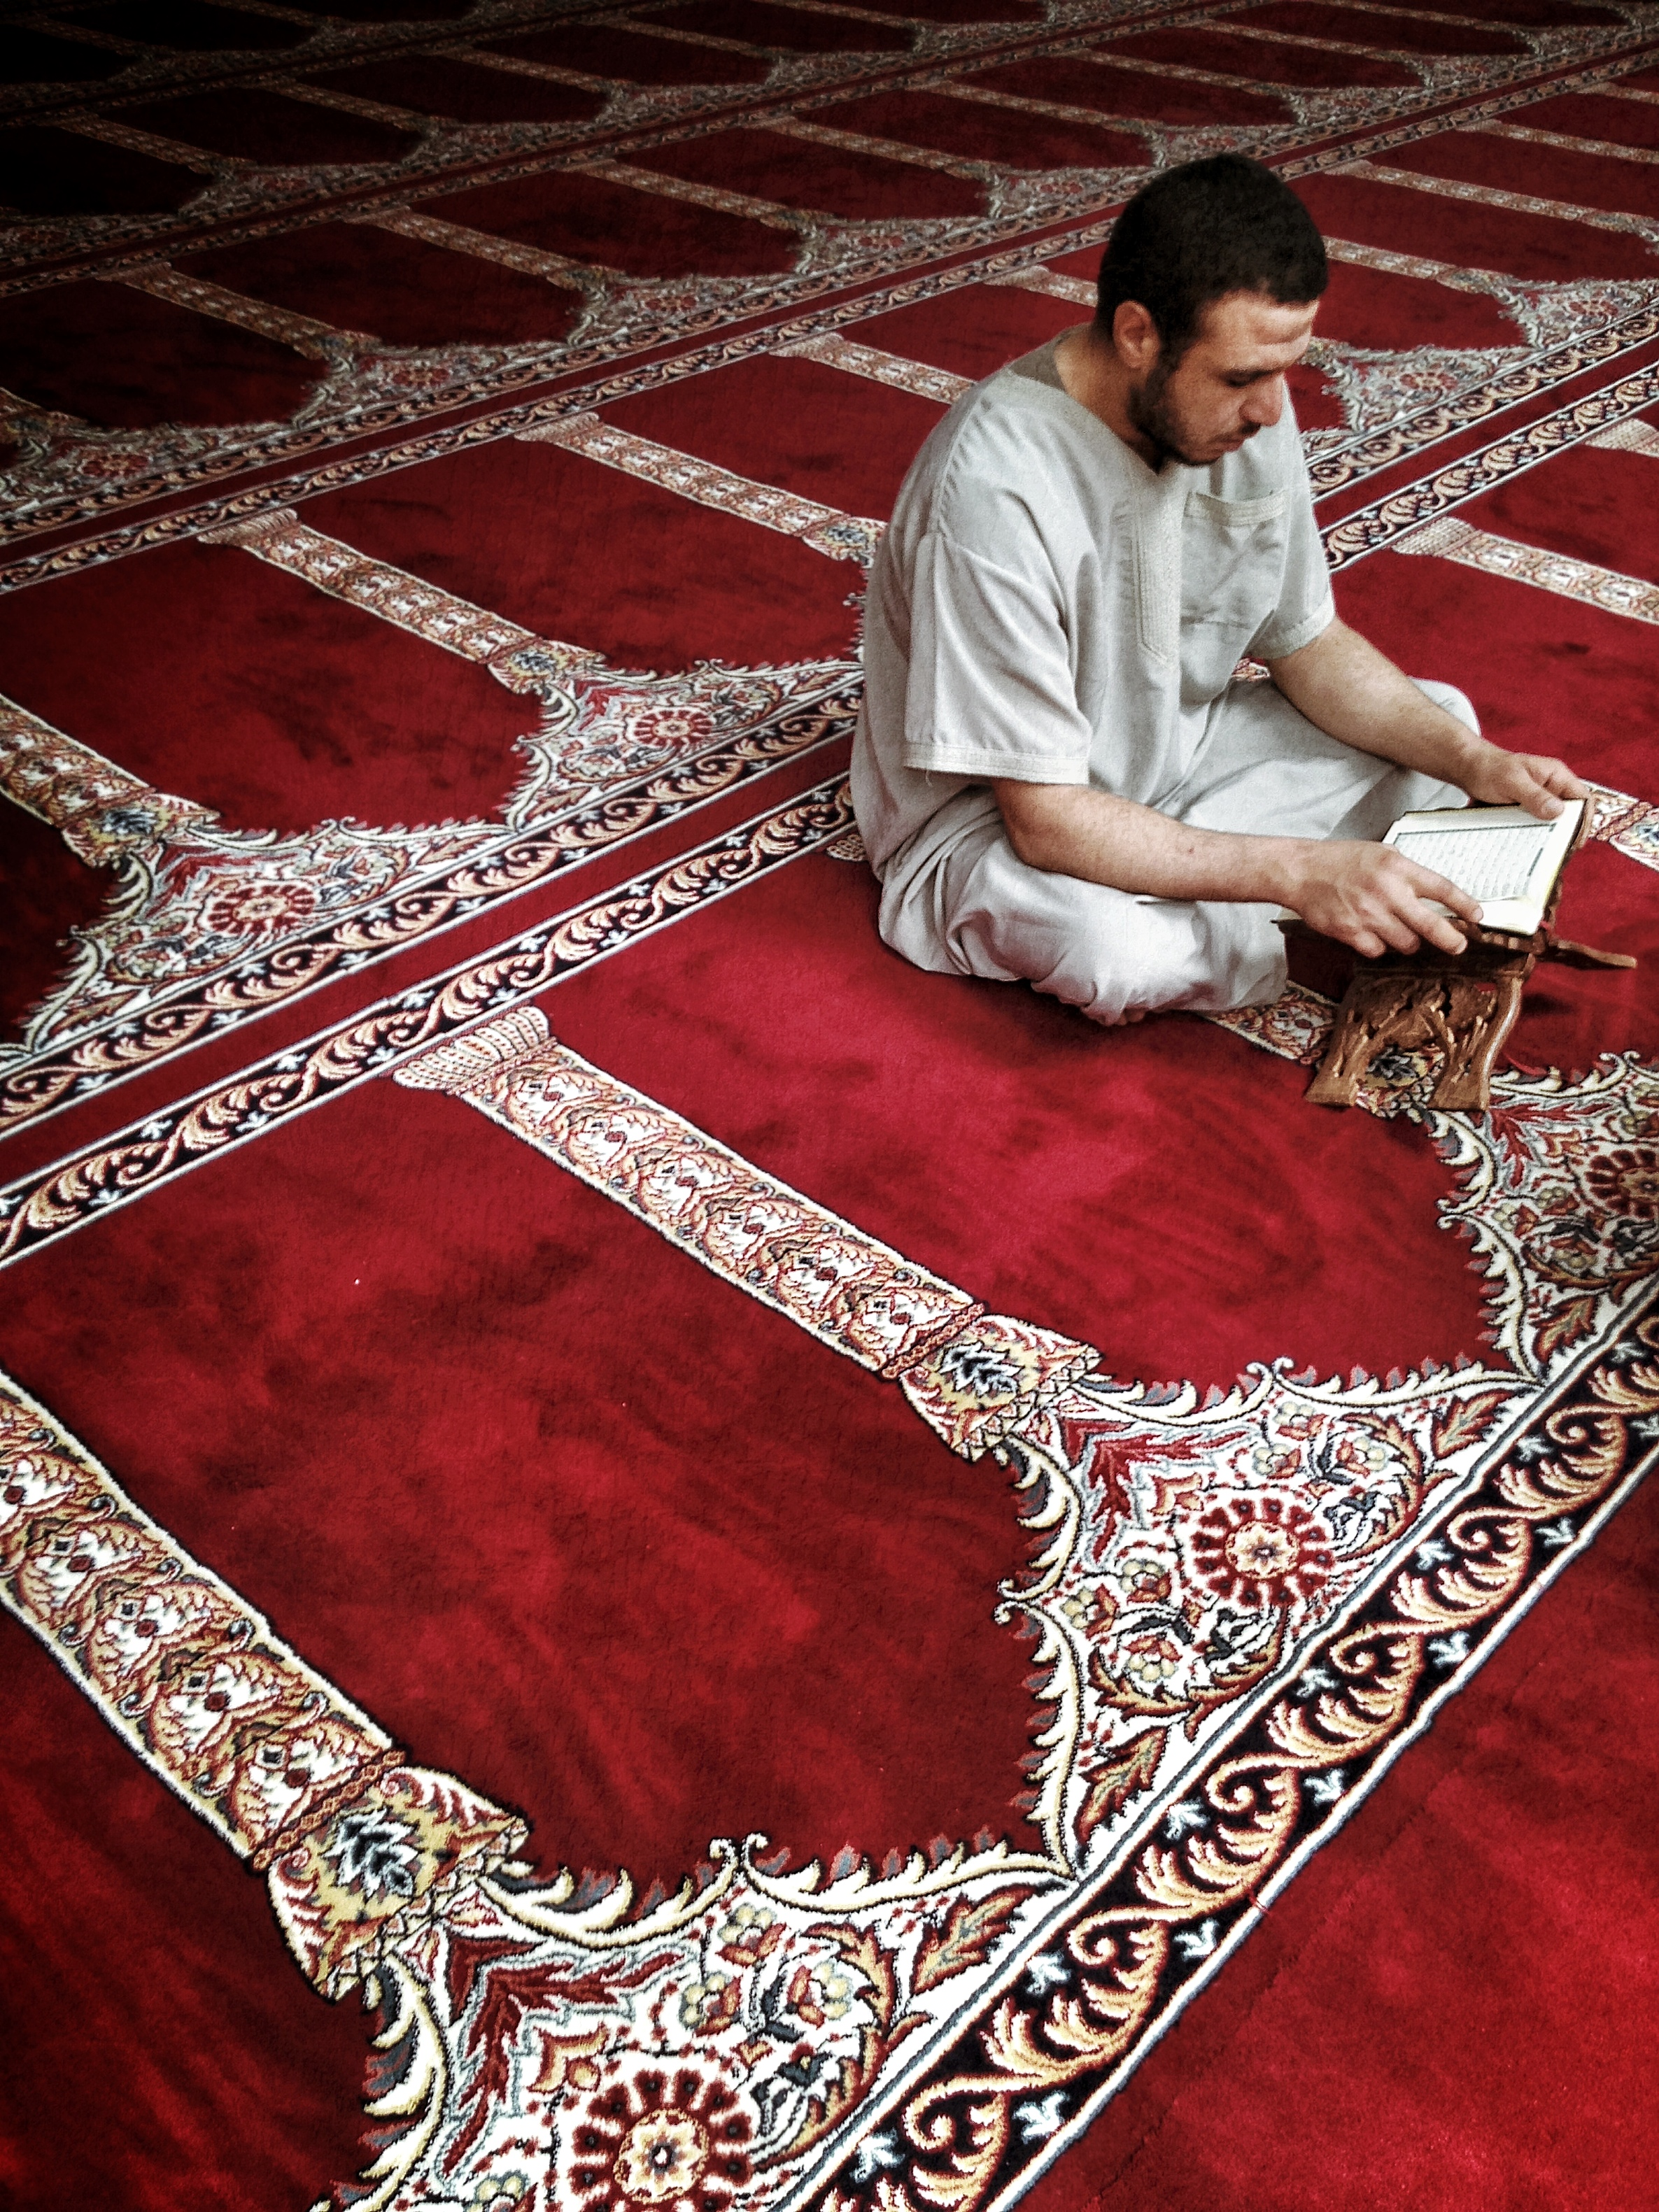 սովորել Quraan  belajar AlQuran  foghlaim Quraan   дізнатися Quraan   õppida Koraani   ịmụta Quraan   lærir Quraan   aprender Qura'an   imparare Qur'an Photo-2